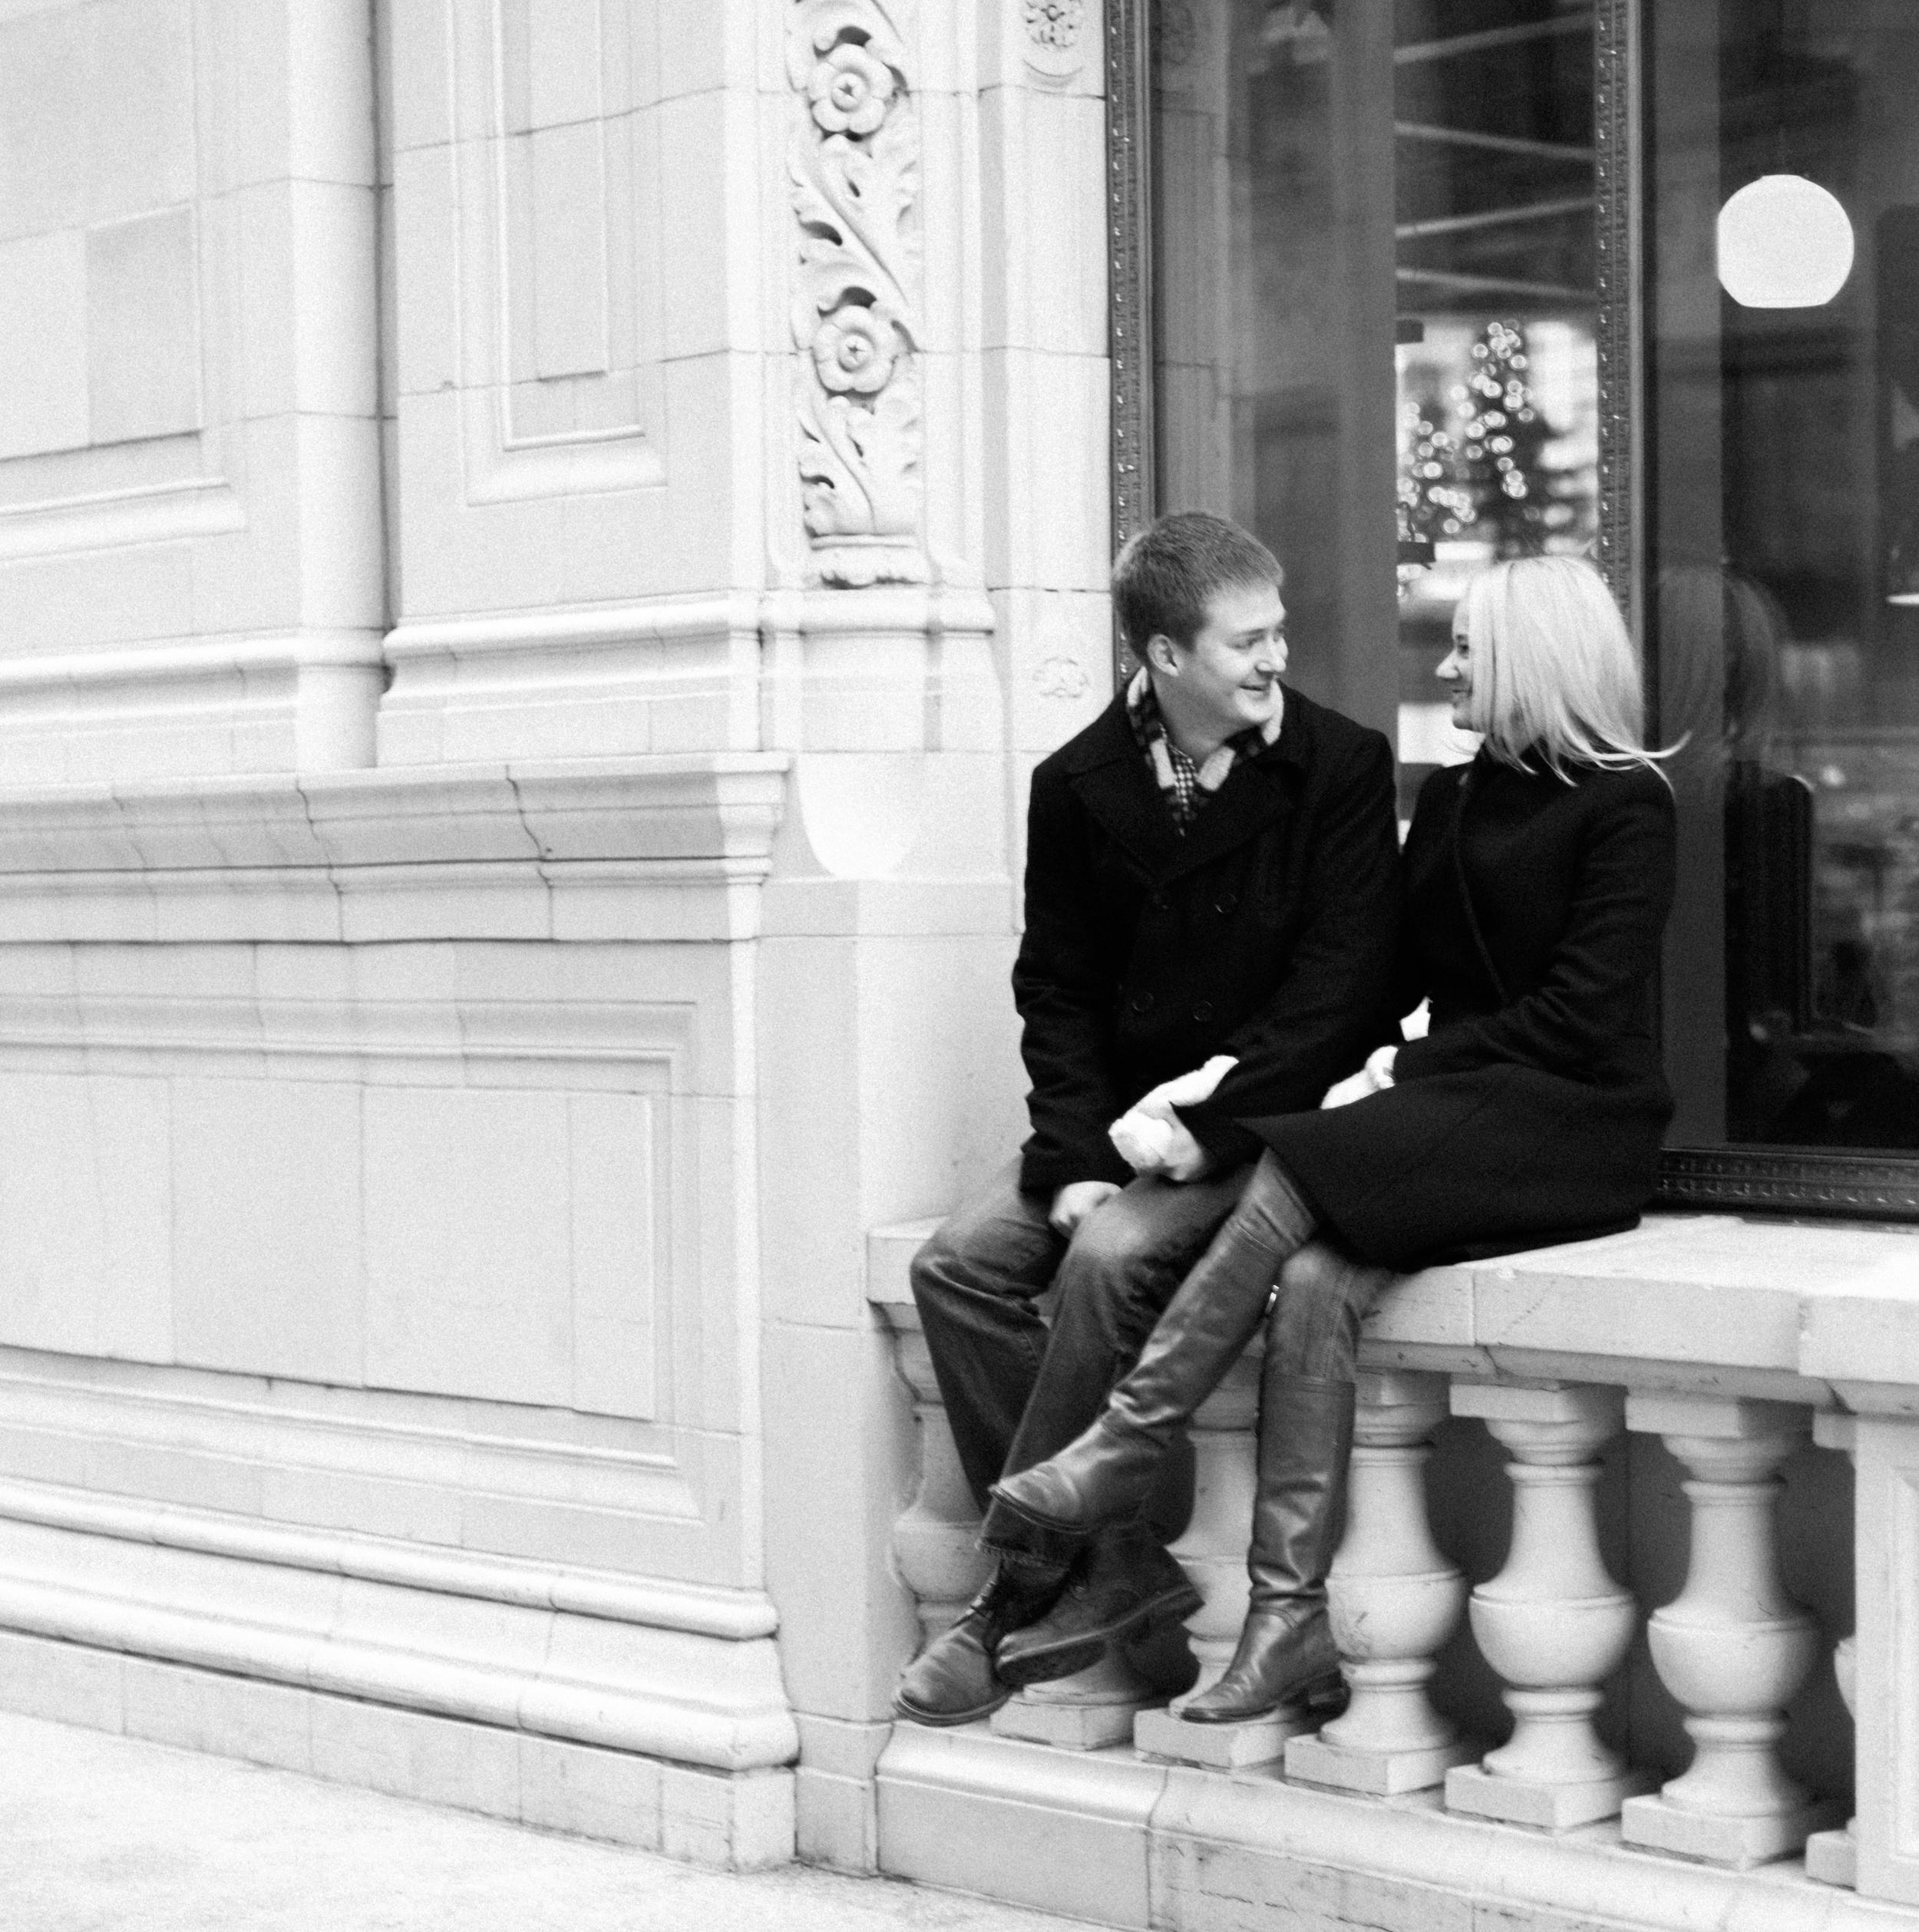 Bonphotage Winter Engagement